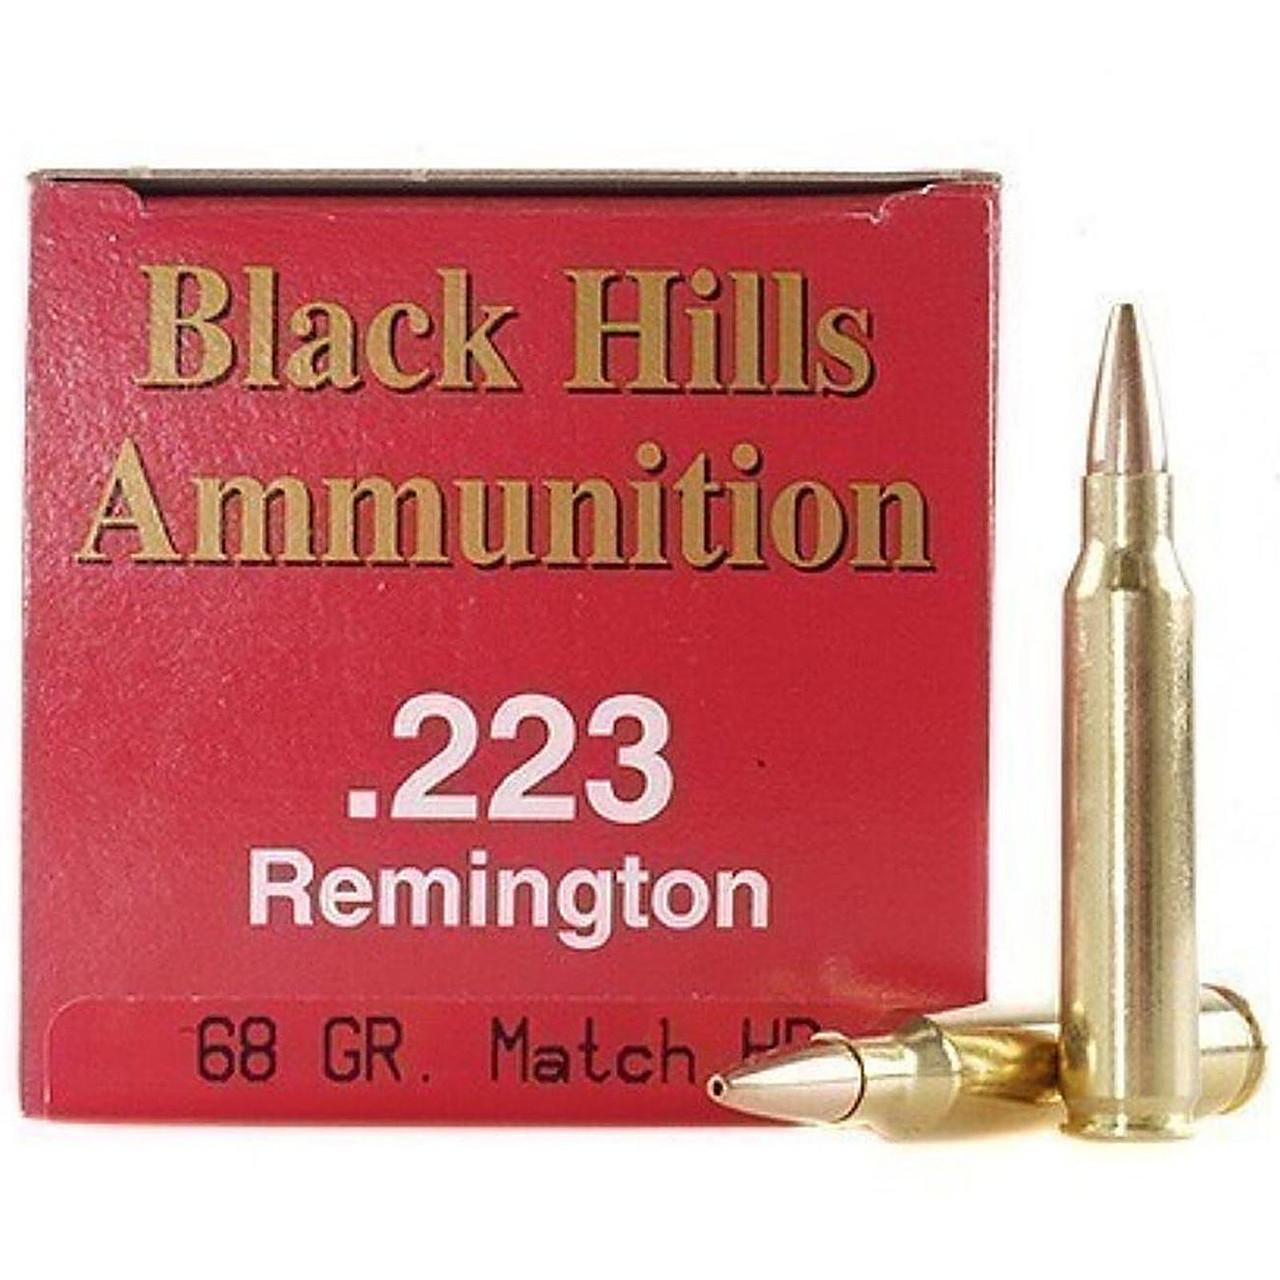 .223//5.56 Brass Decal Gun Ammunition Box Box Firearm Orange Sticker OR 2 Pack